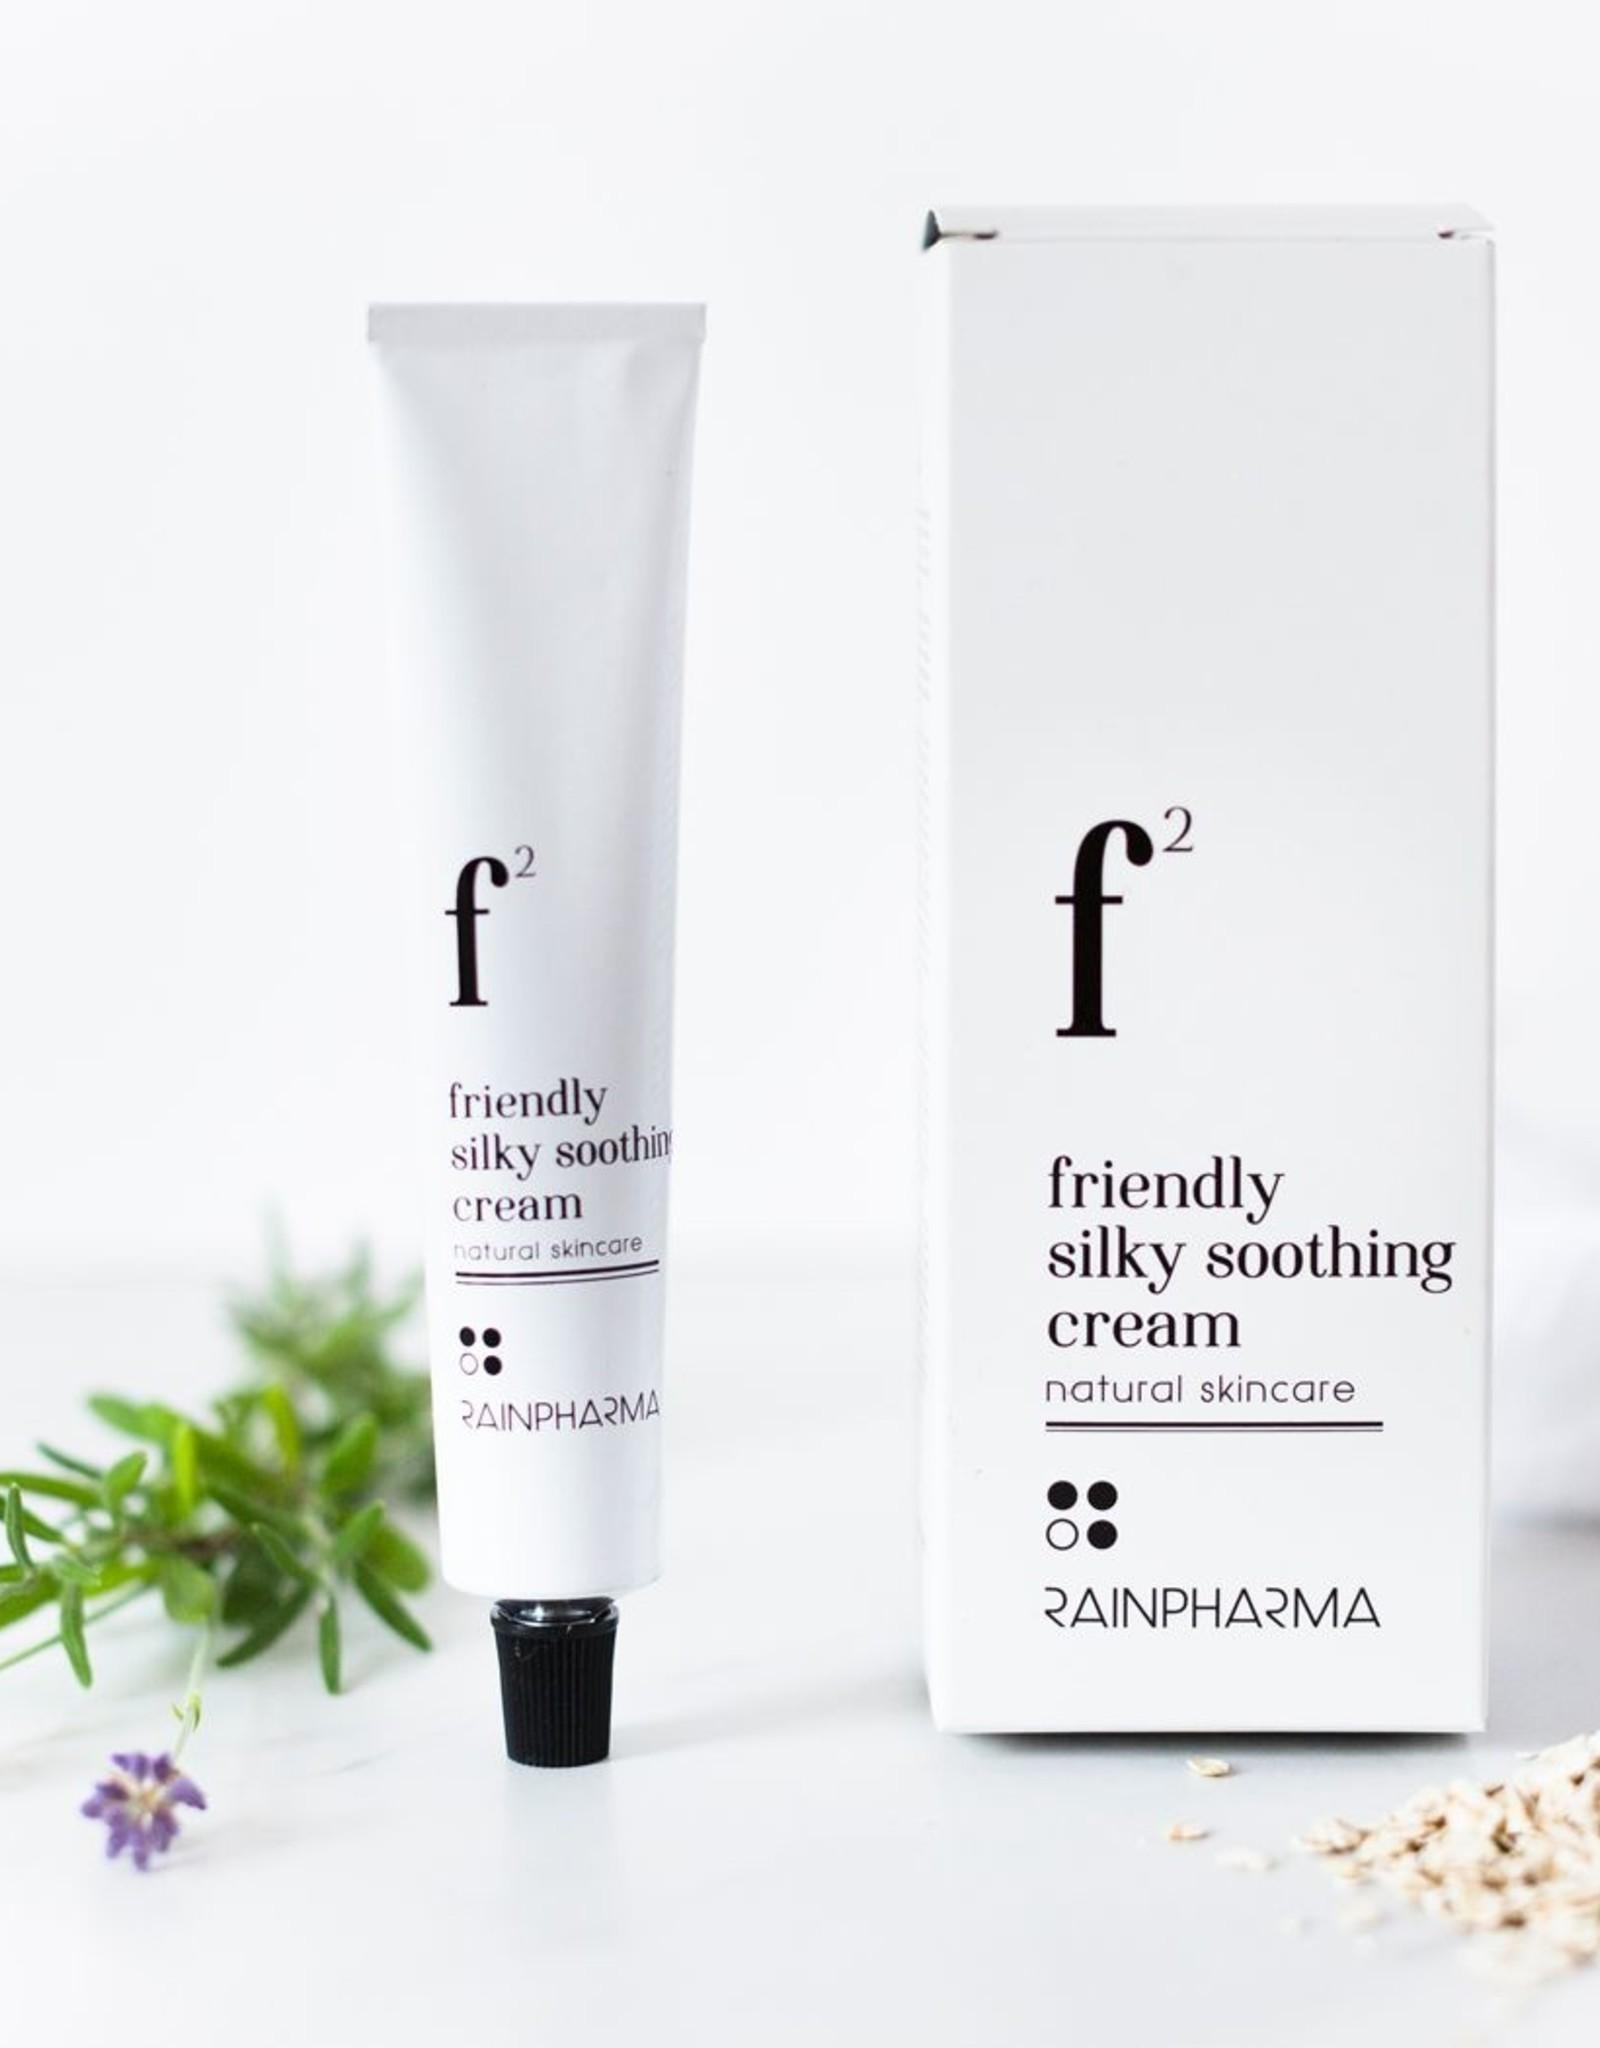 RainPharma F2 - Friendly Silky Soothing Cream 50ml - Rainpharma